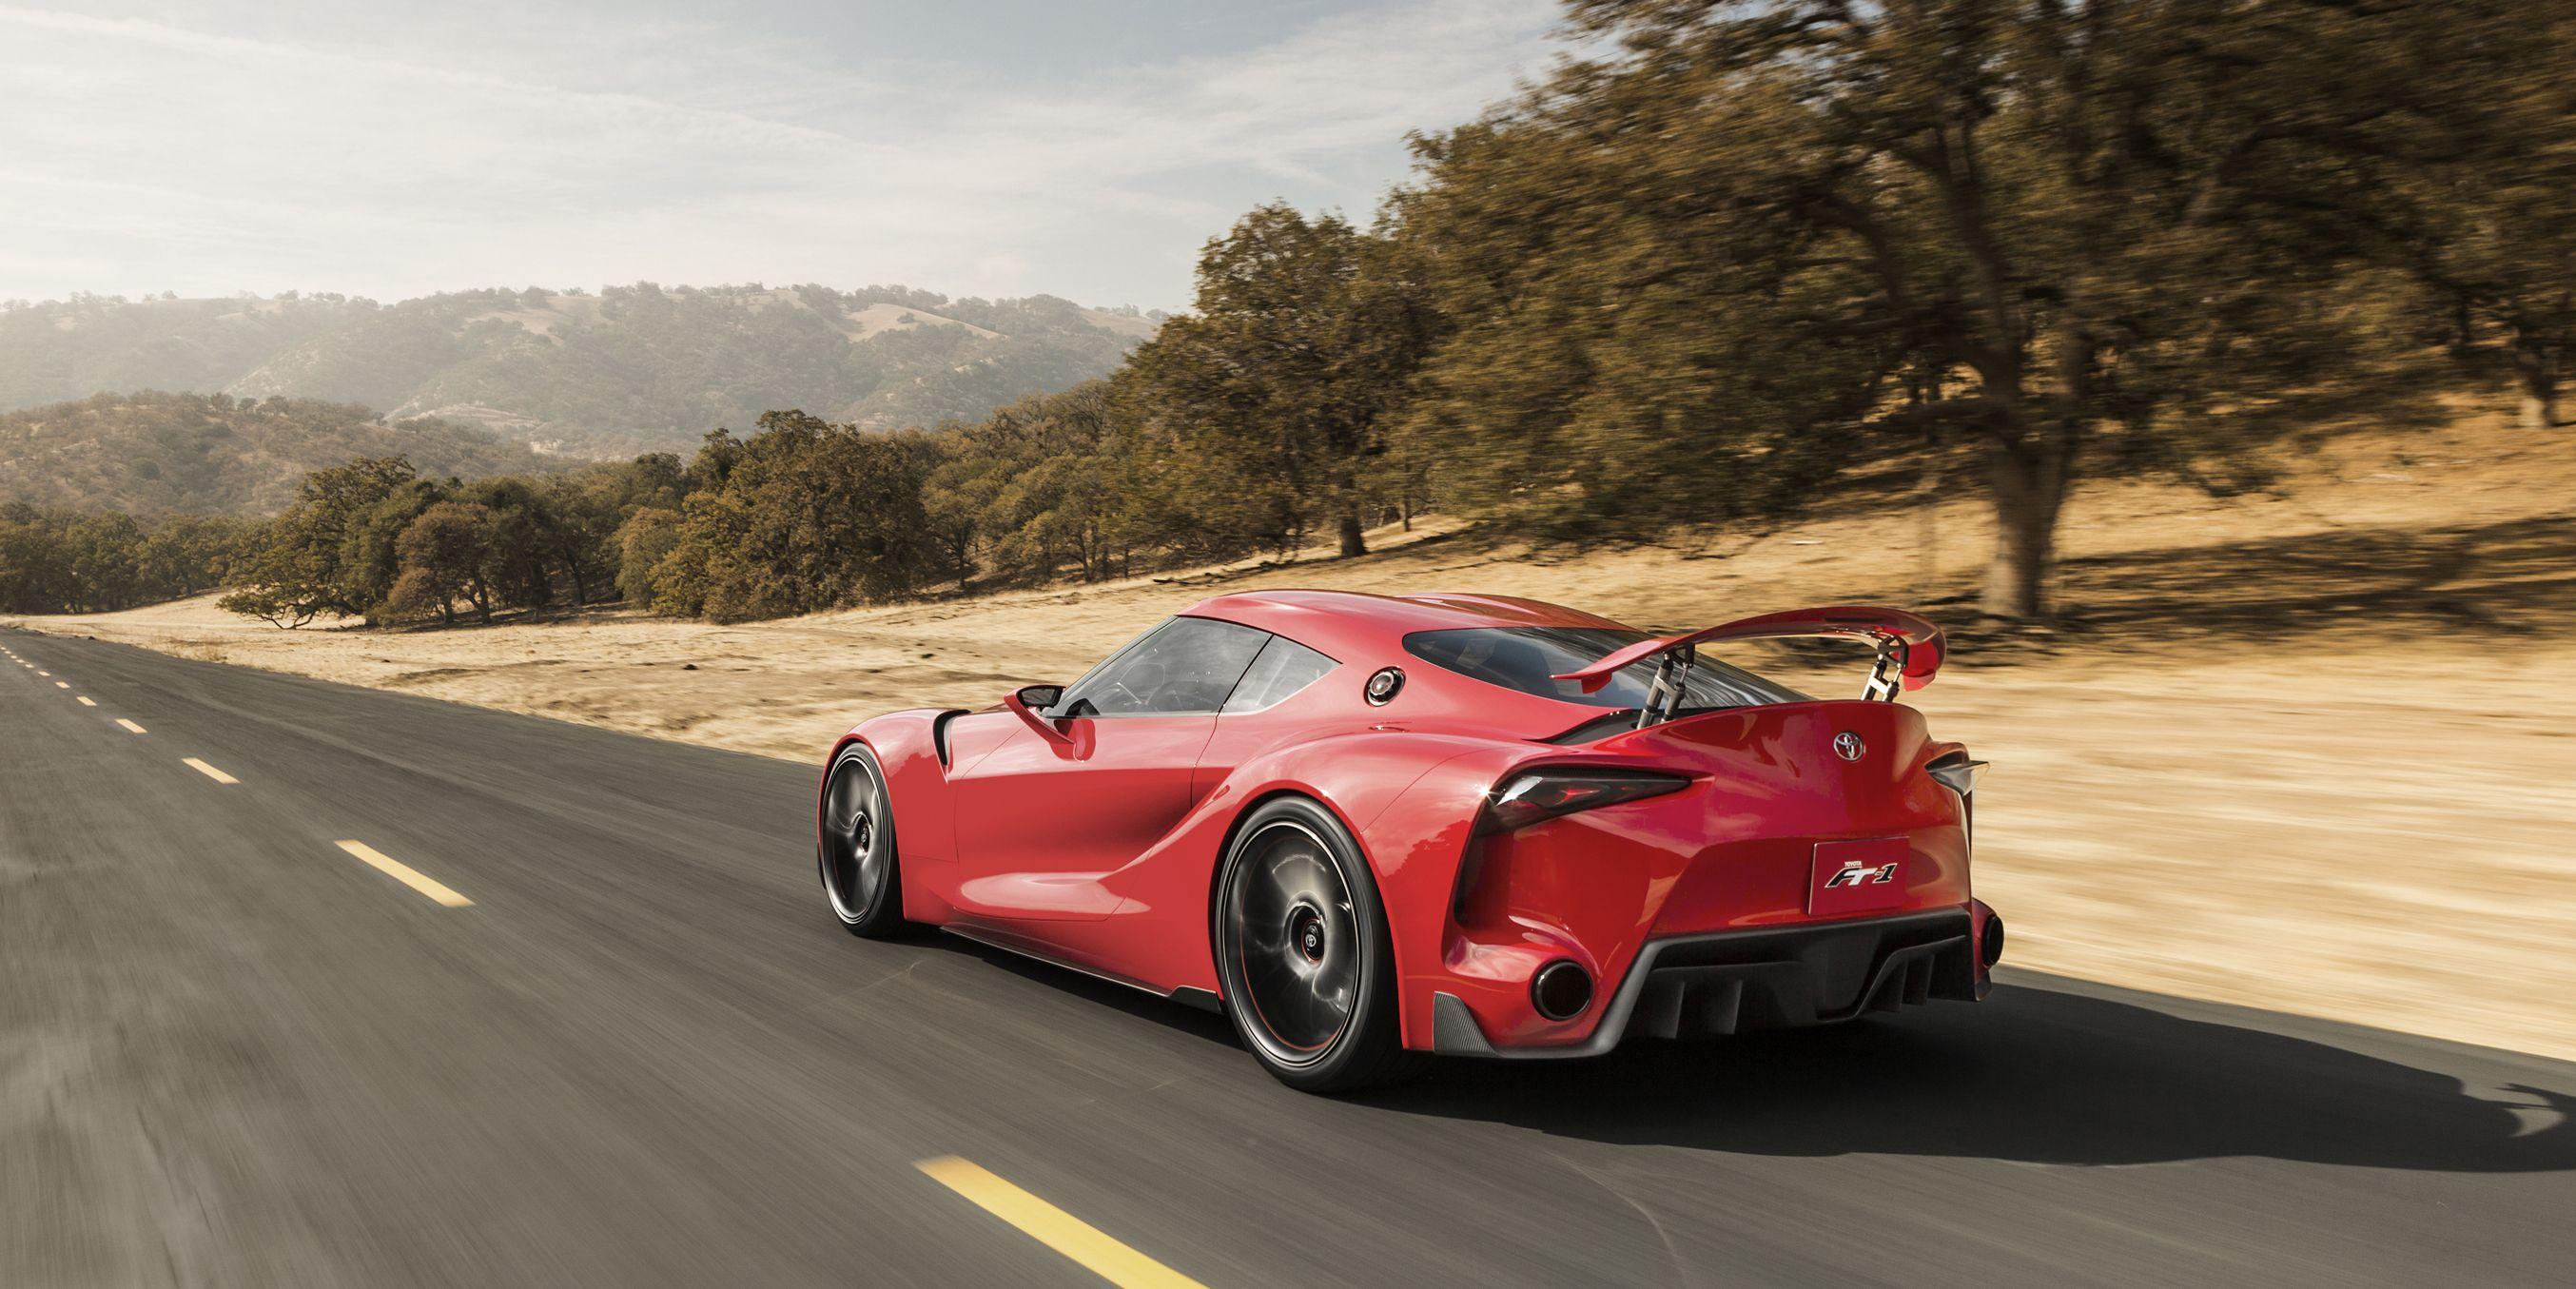 2019 Toyota Supra News, Price, Release Date - Latest ...